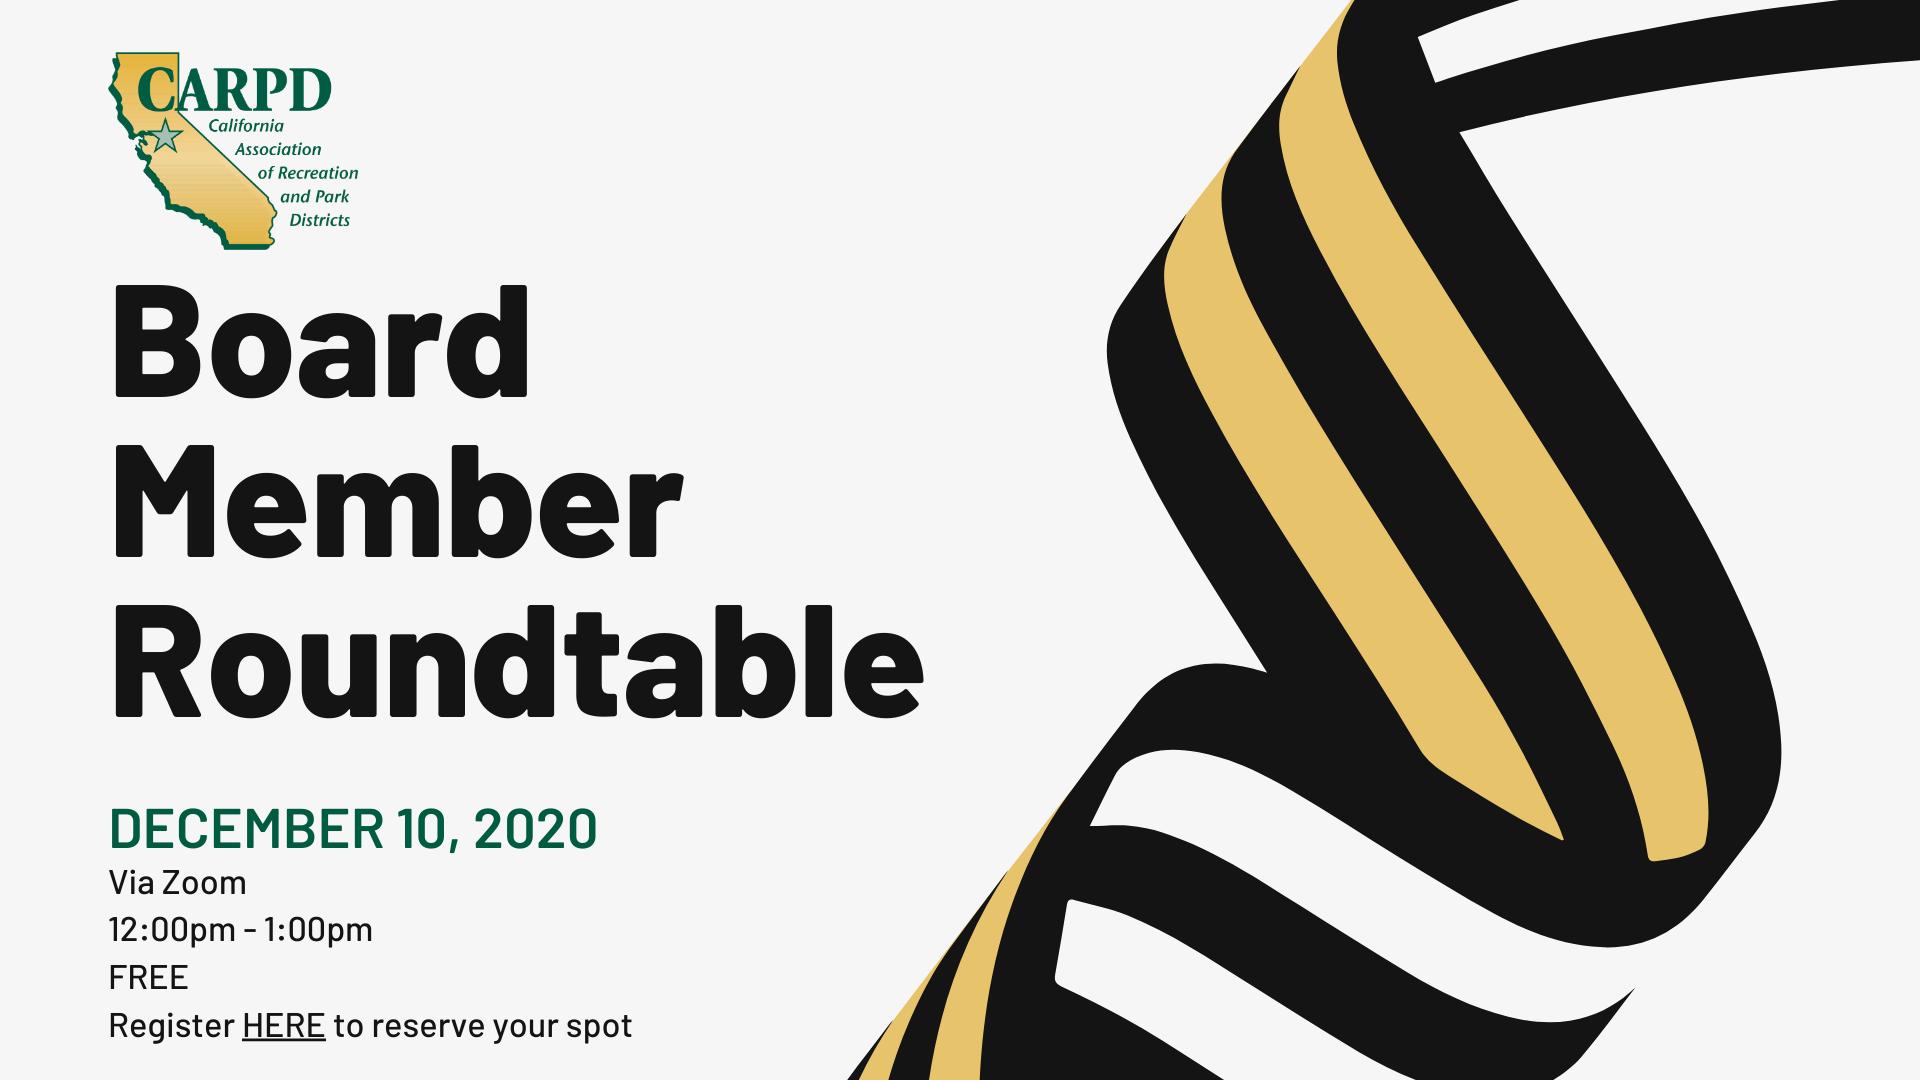 Board Member Roundtable - December 10, 2020